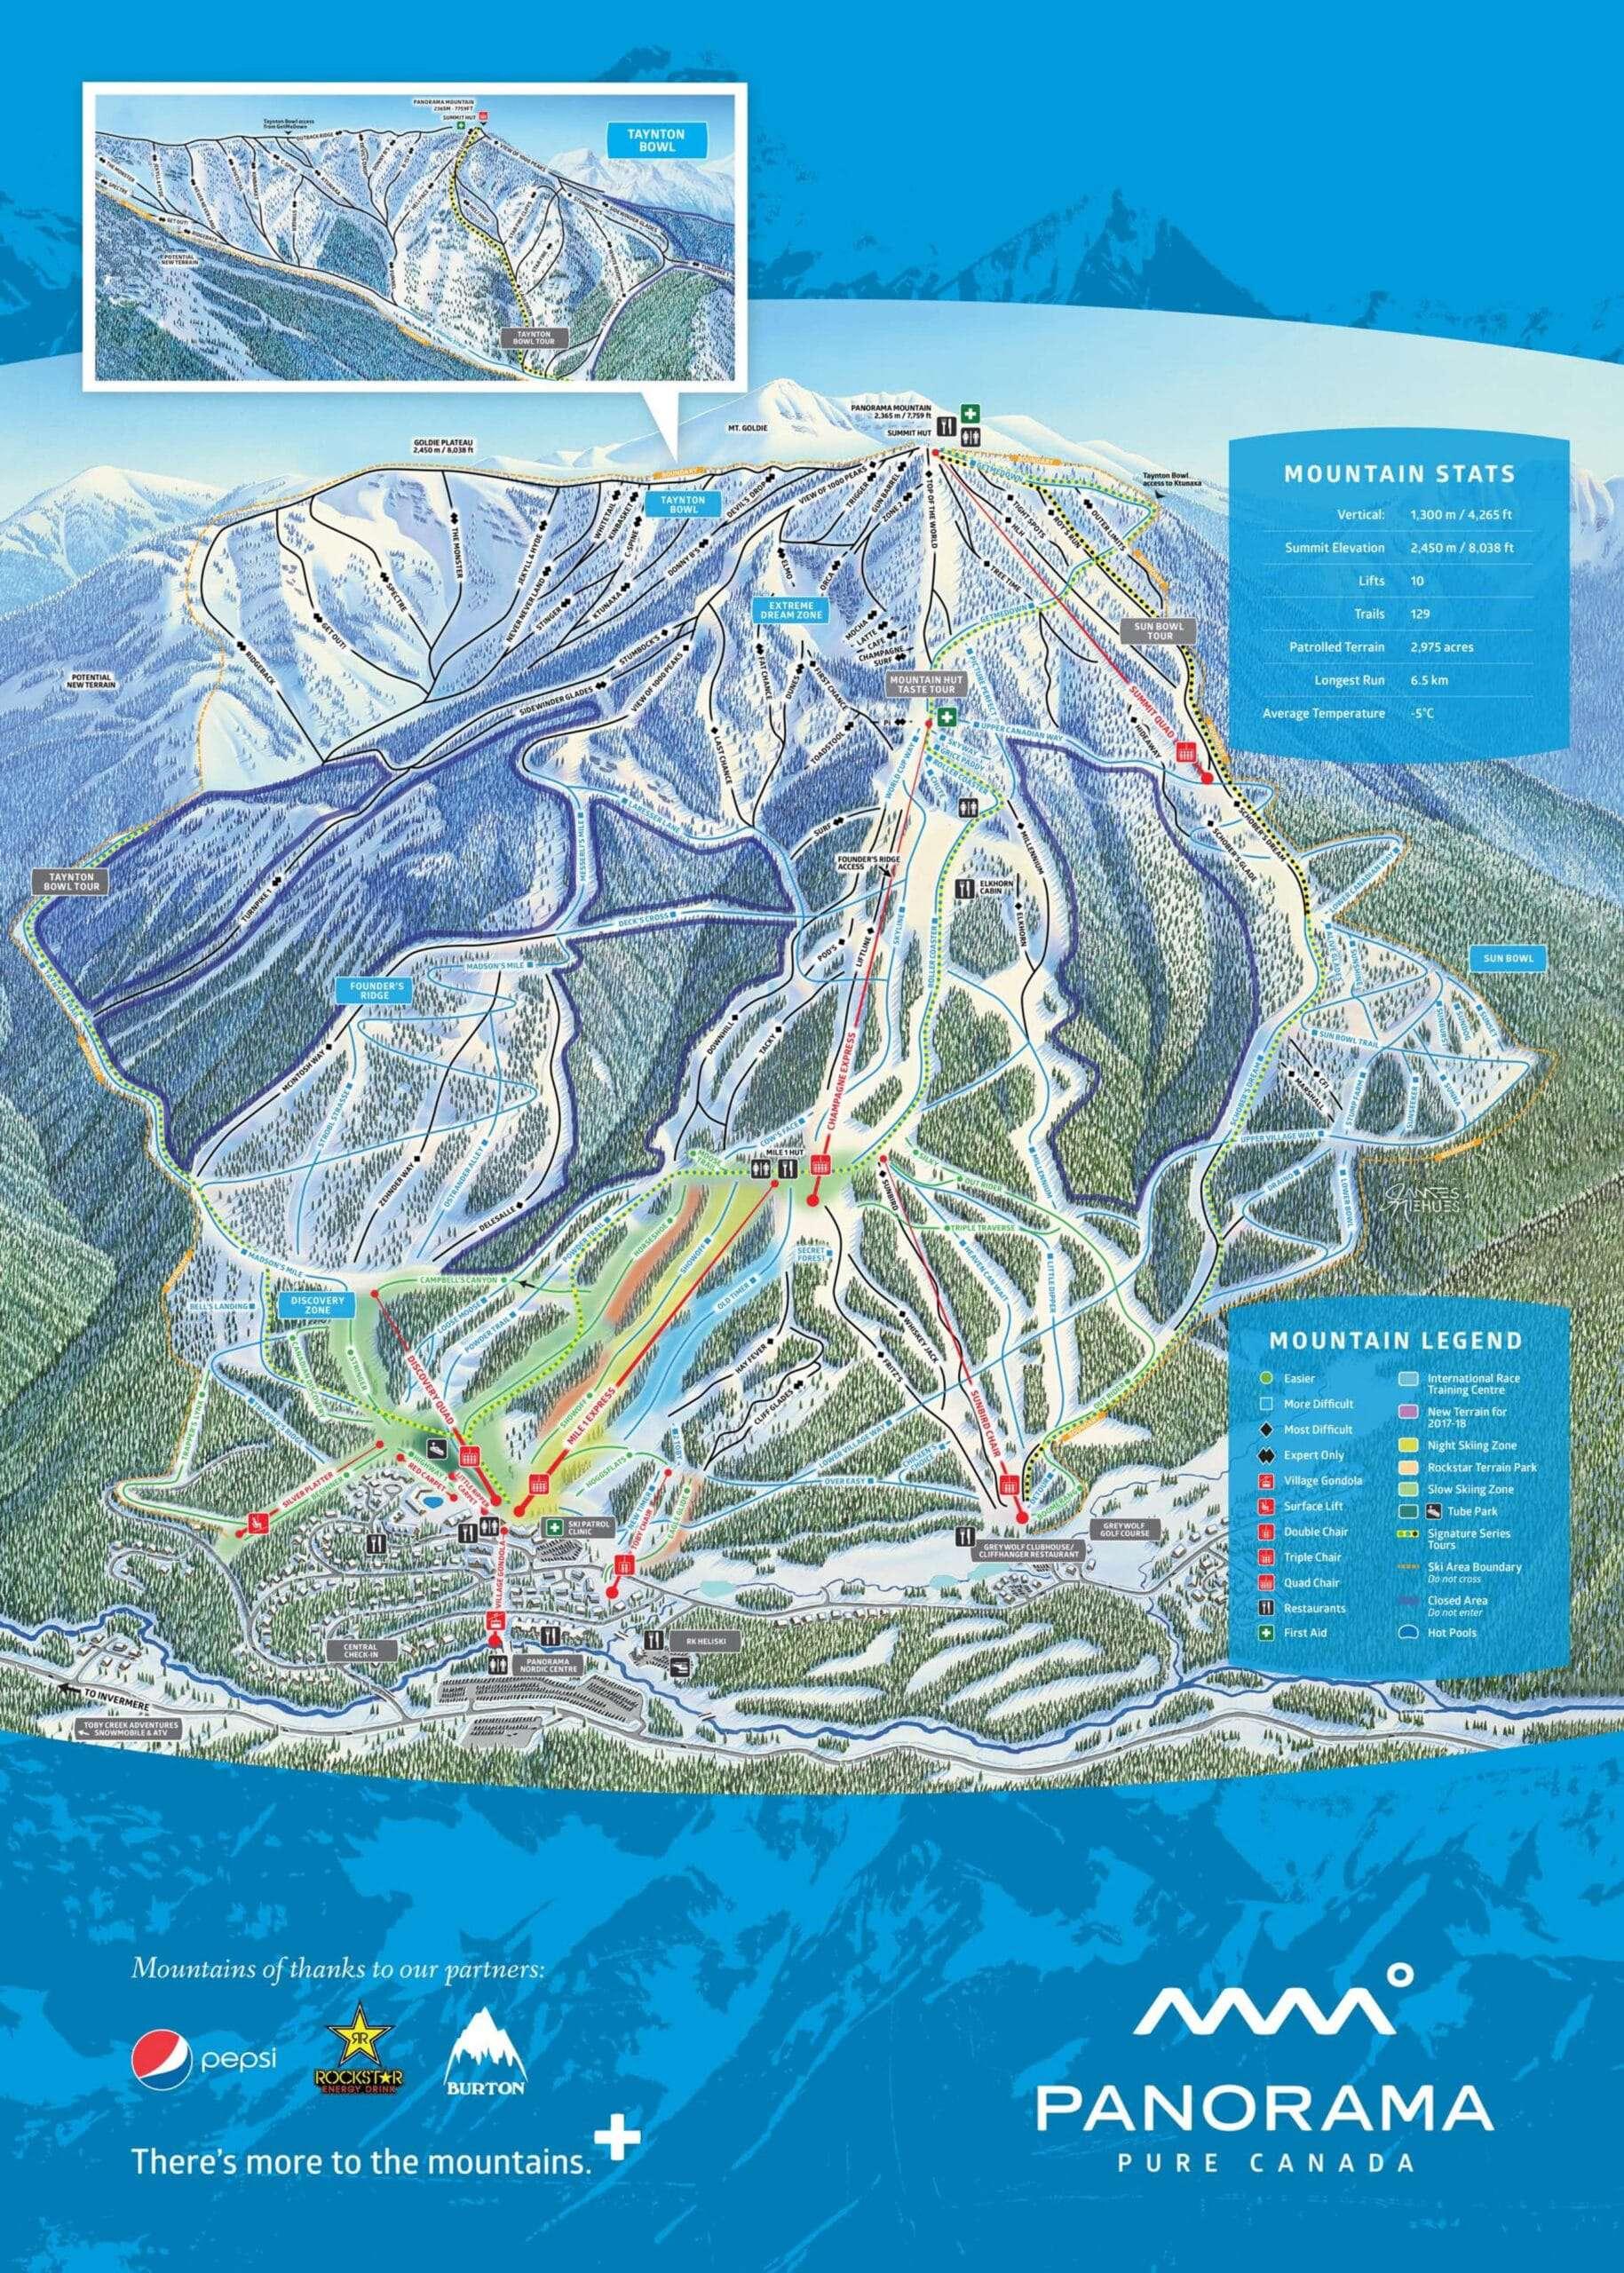 Panorama Ski Trail Map 2019 scaled